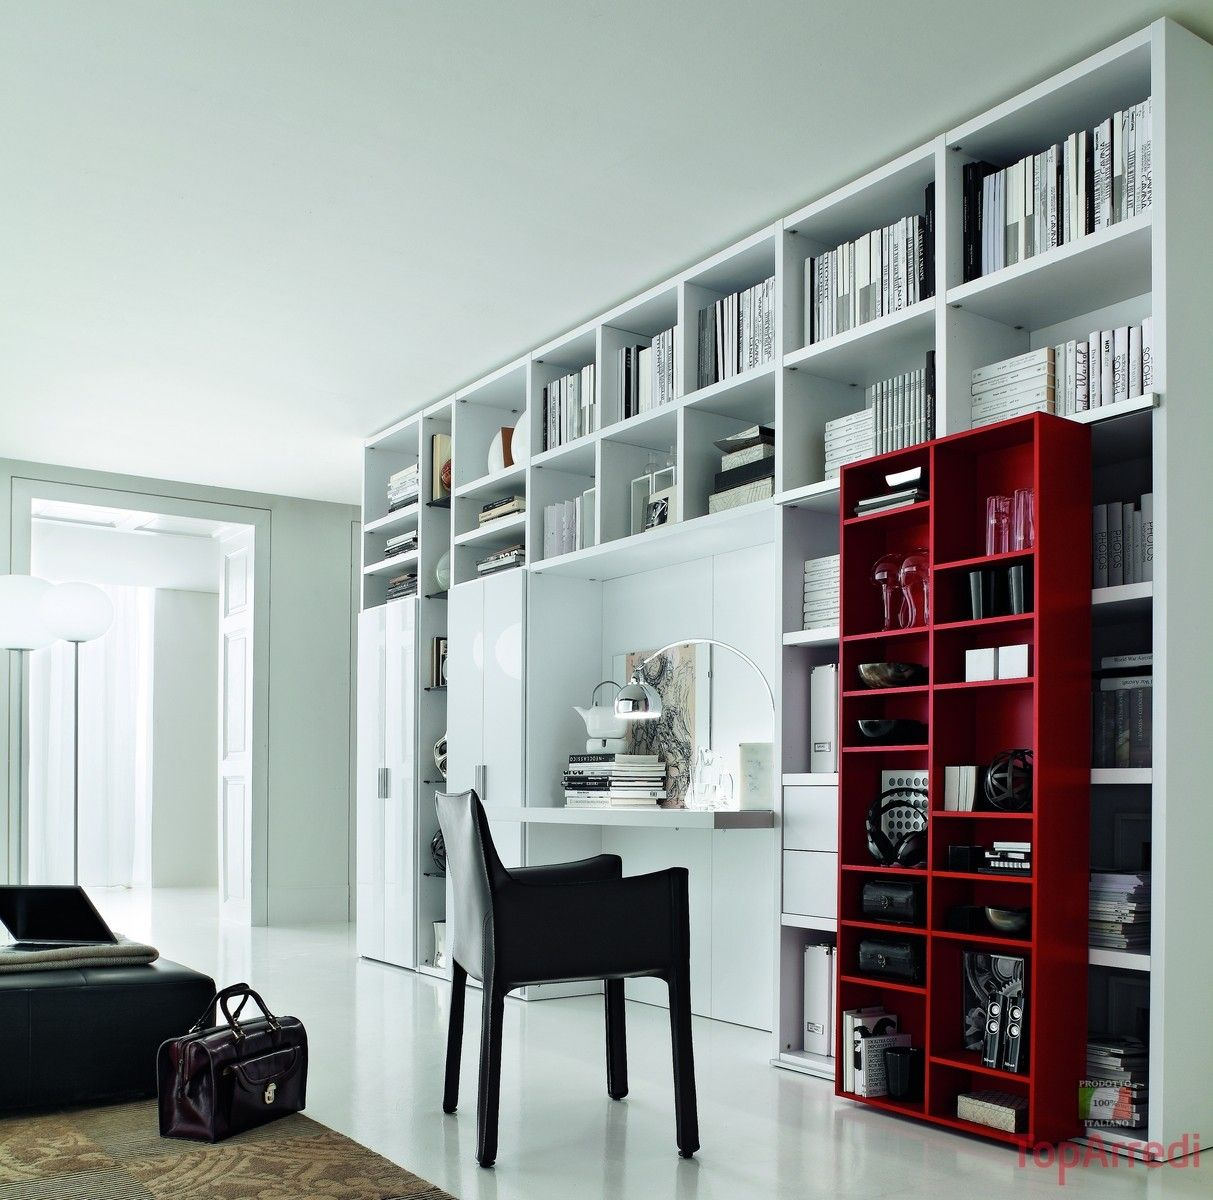 libreria a ponte con scrivania - Cerca con Google | Cool book spaces ...